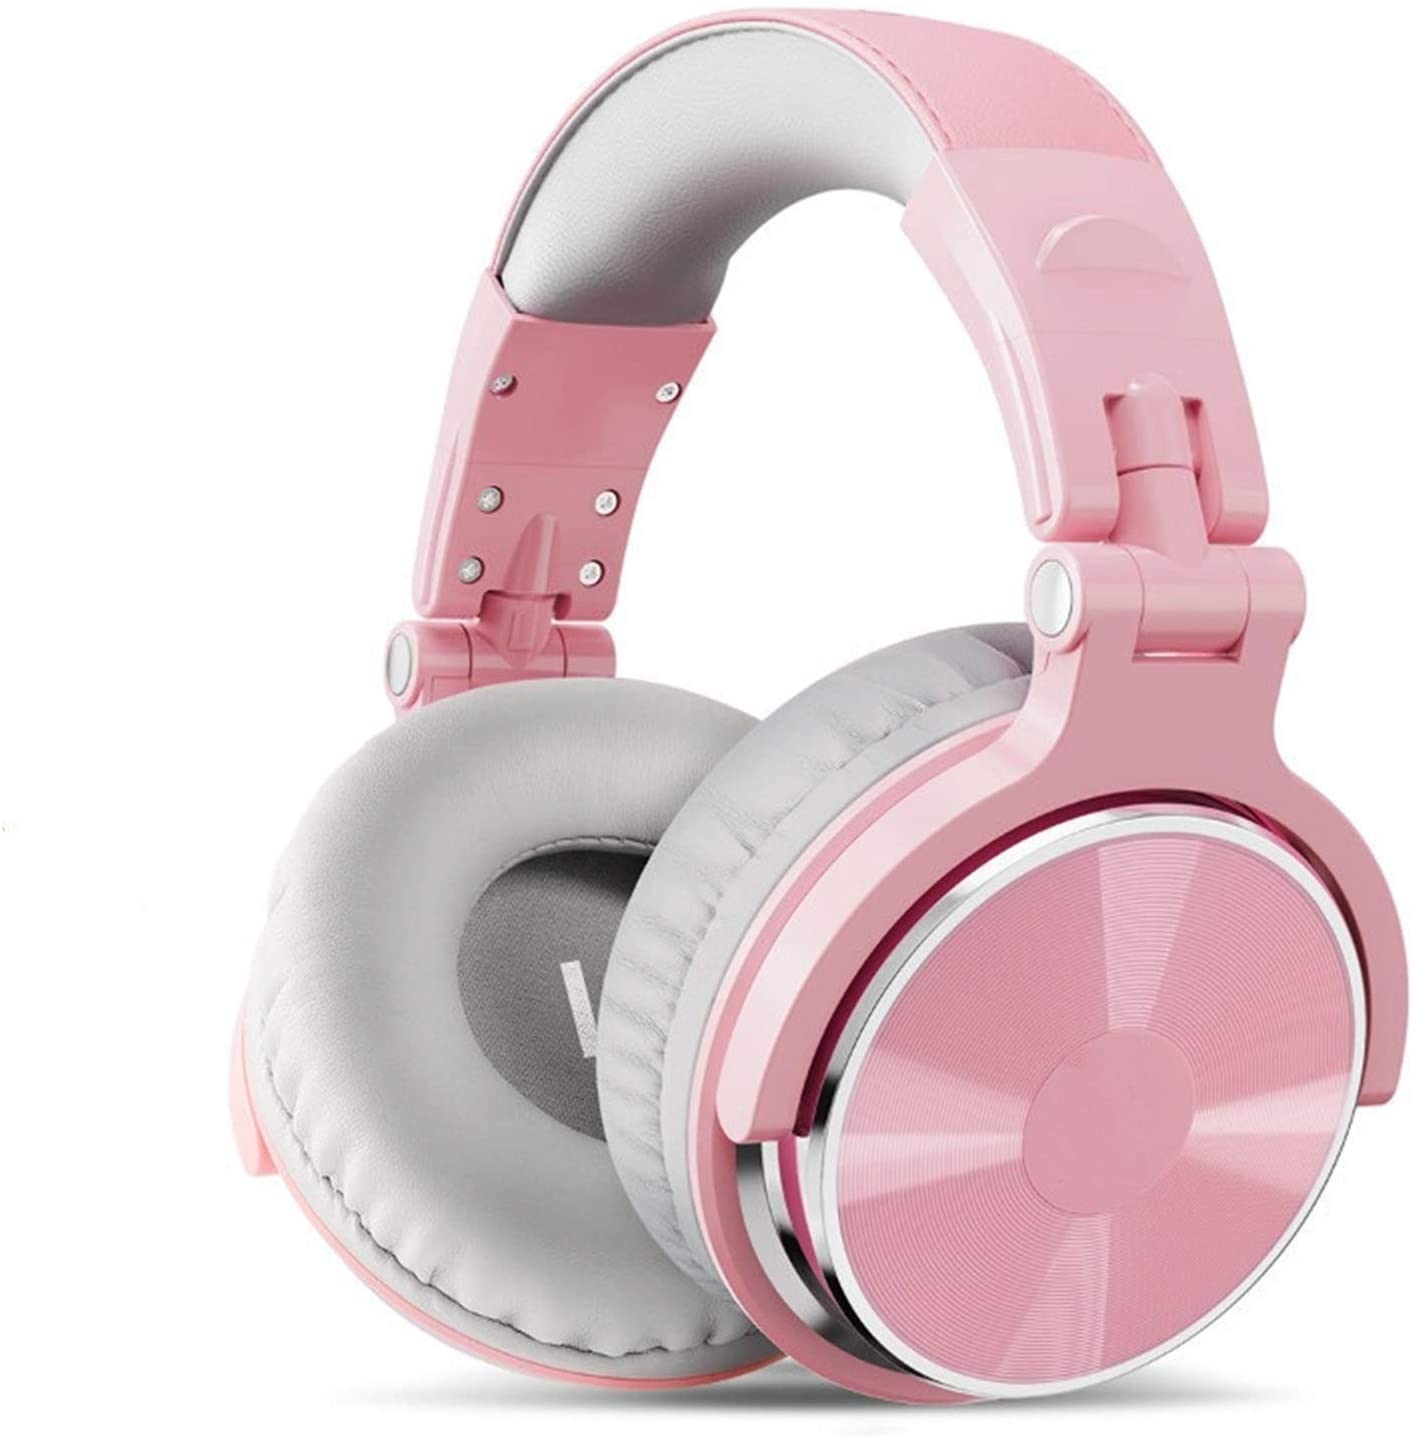 CHAONONG 헤드폰 유선 헤드폰에서 전문 스튜디오 동적 STEREOHEADPHONE 과 함께 마이크를 헤드셋을 모니터링을 위한 음악 전화 헤드폰(색상:표준 핑크색)